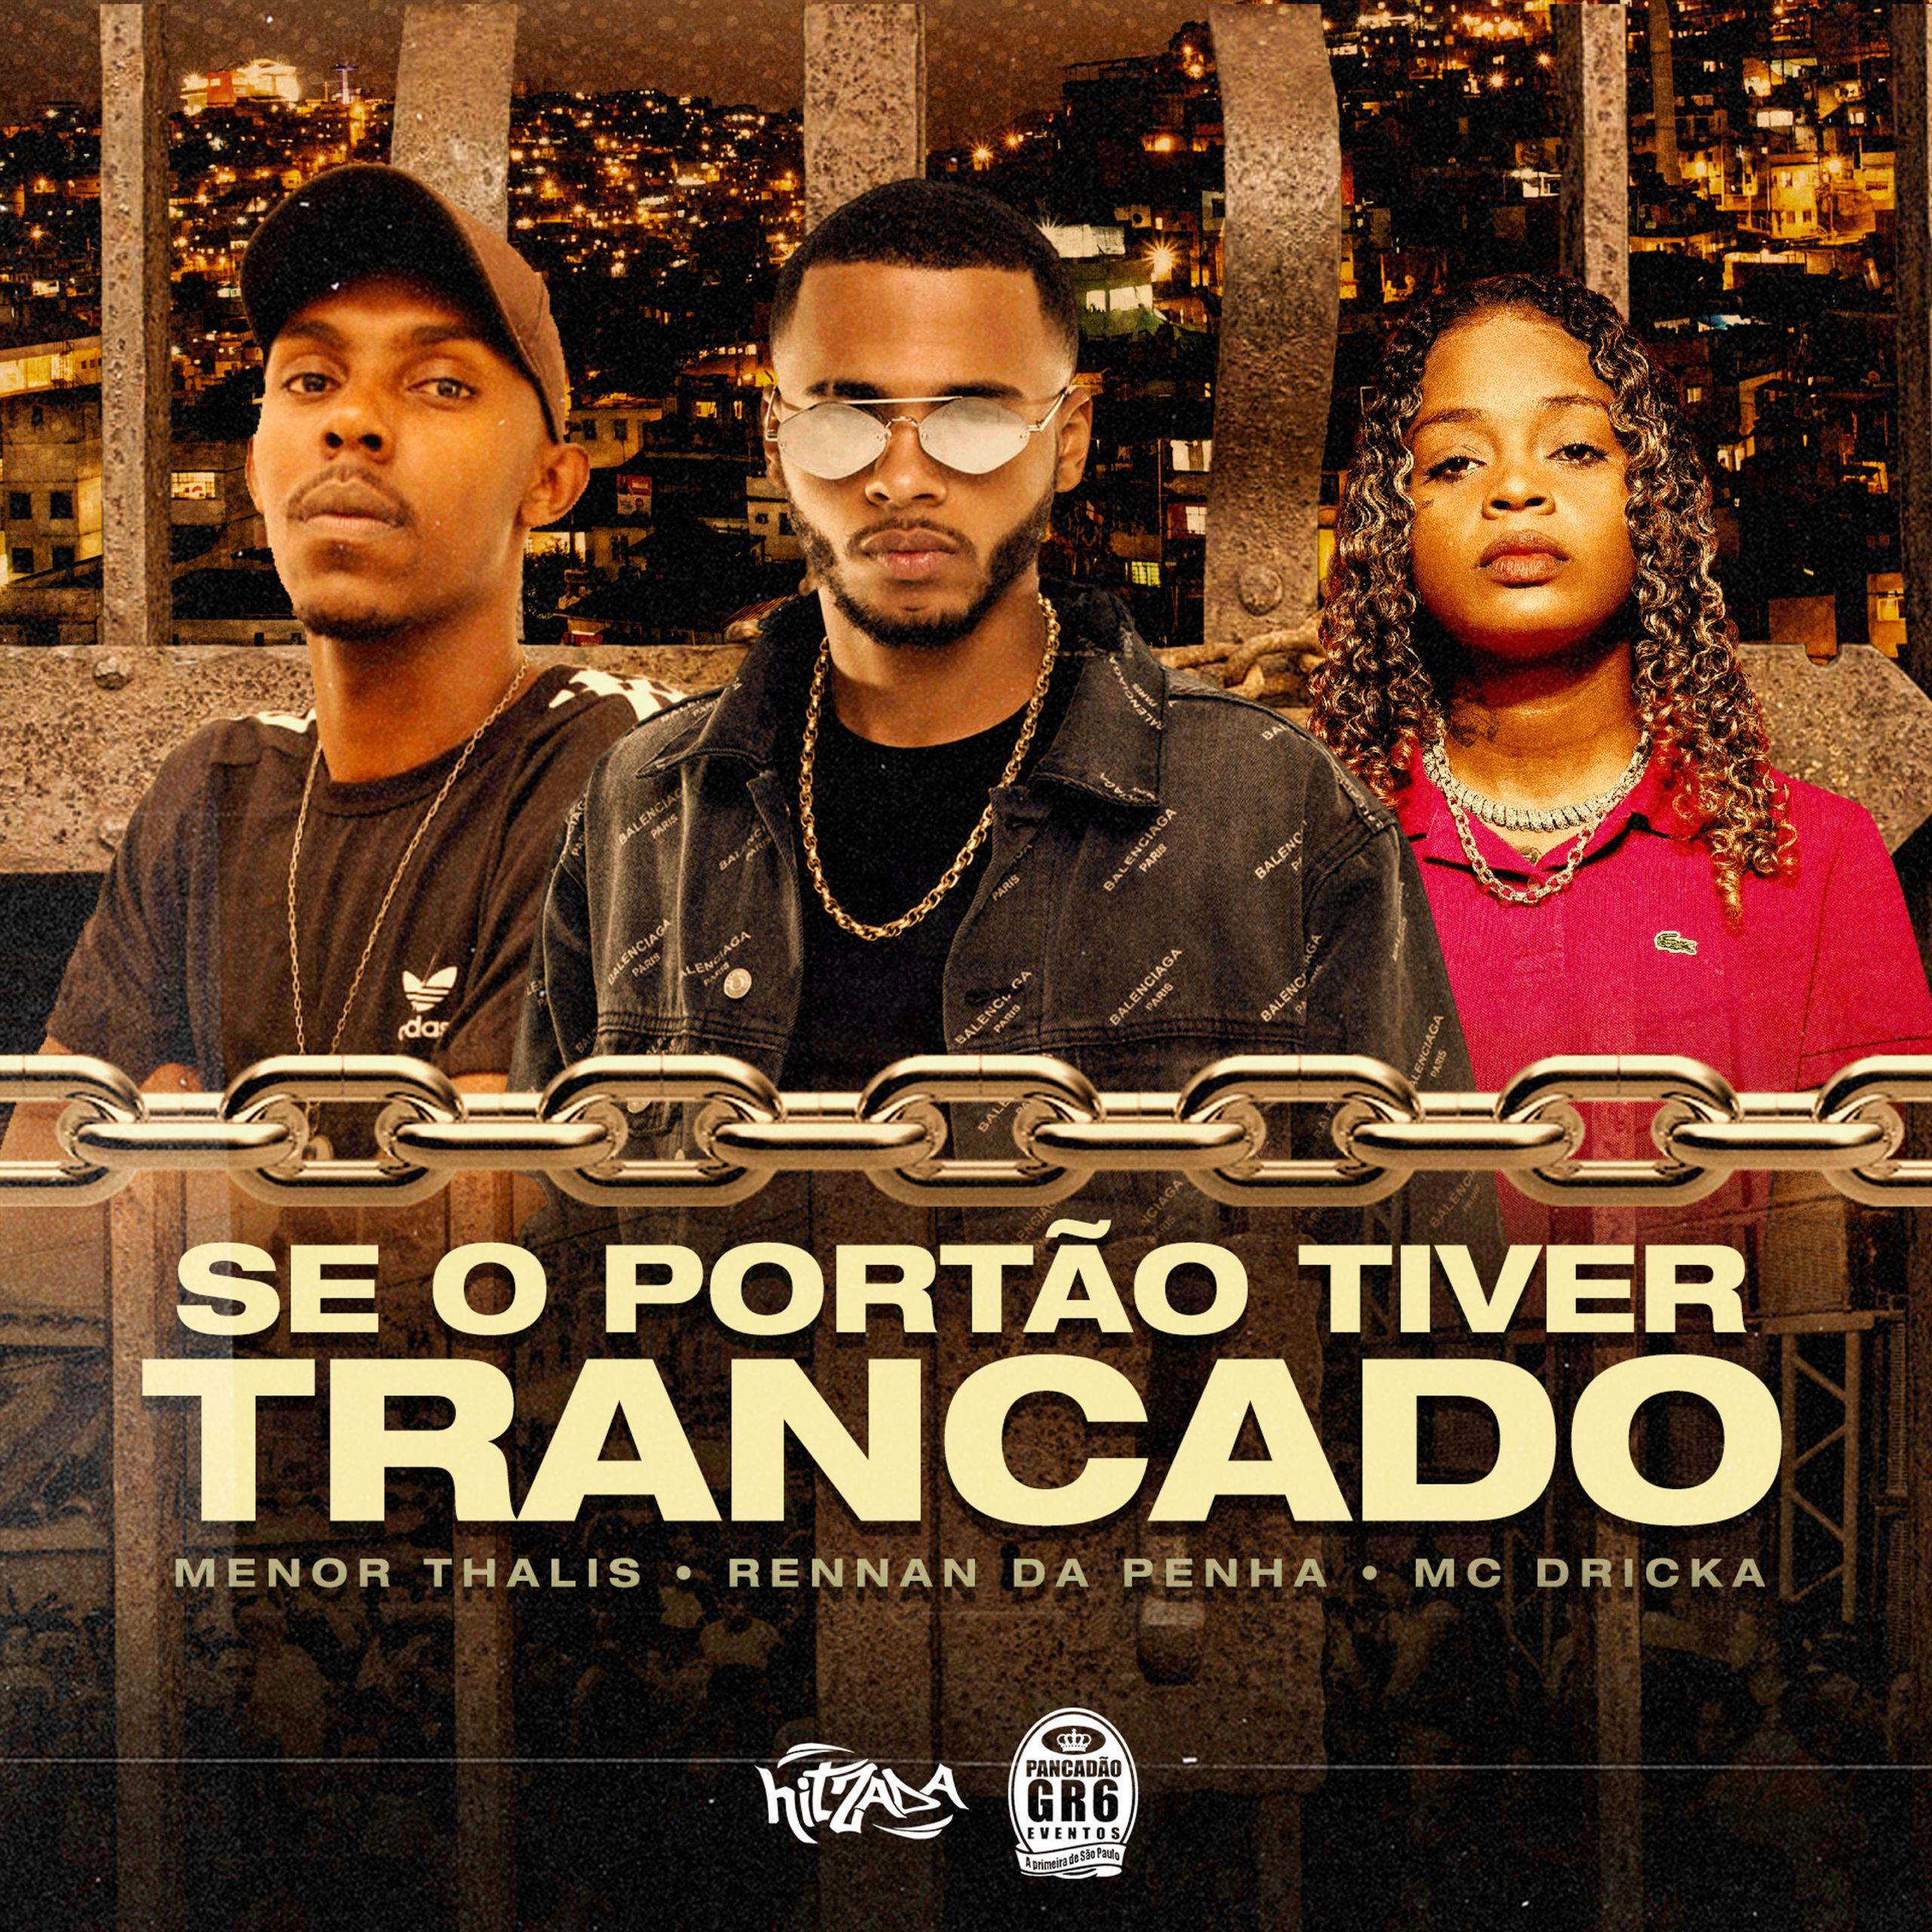 Rennan da Penha, MC Dricka e Menor Thalis